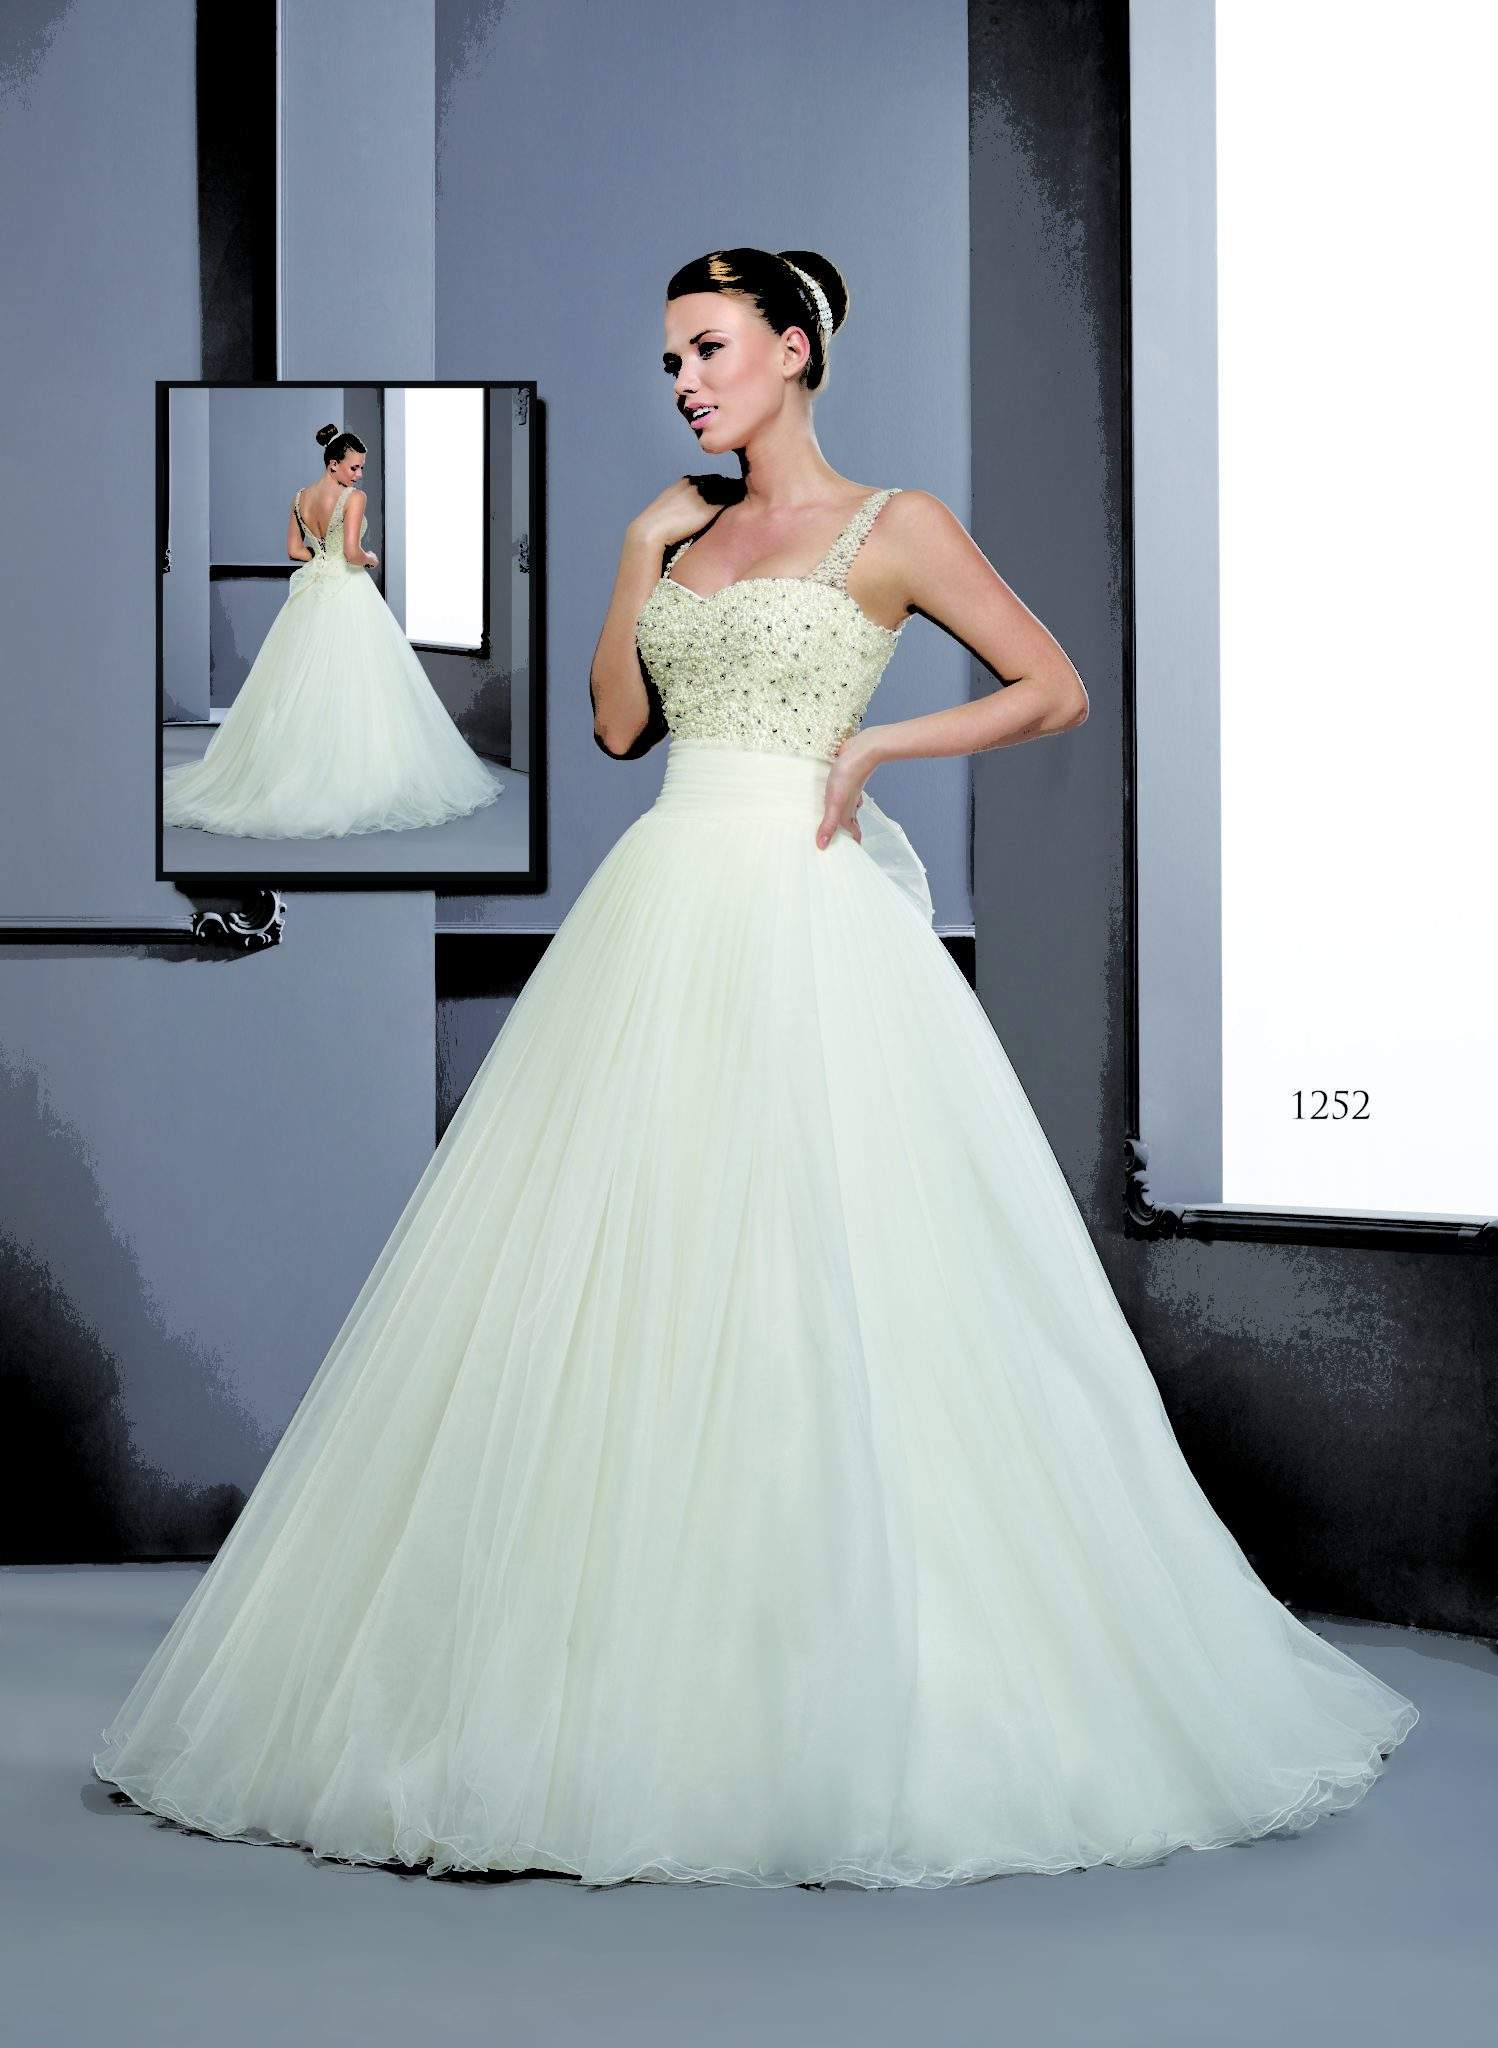 Wedding dresses with spaghetti straps darius cordell fashion ltd empire waist wedding dresses with a wider strap ombrellifo Gallery